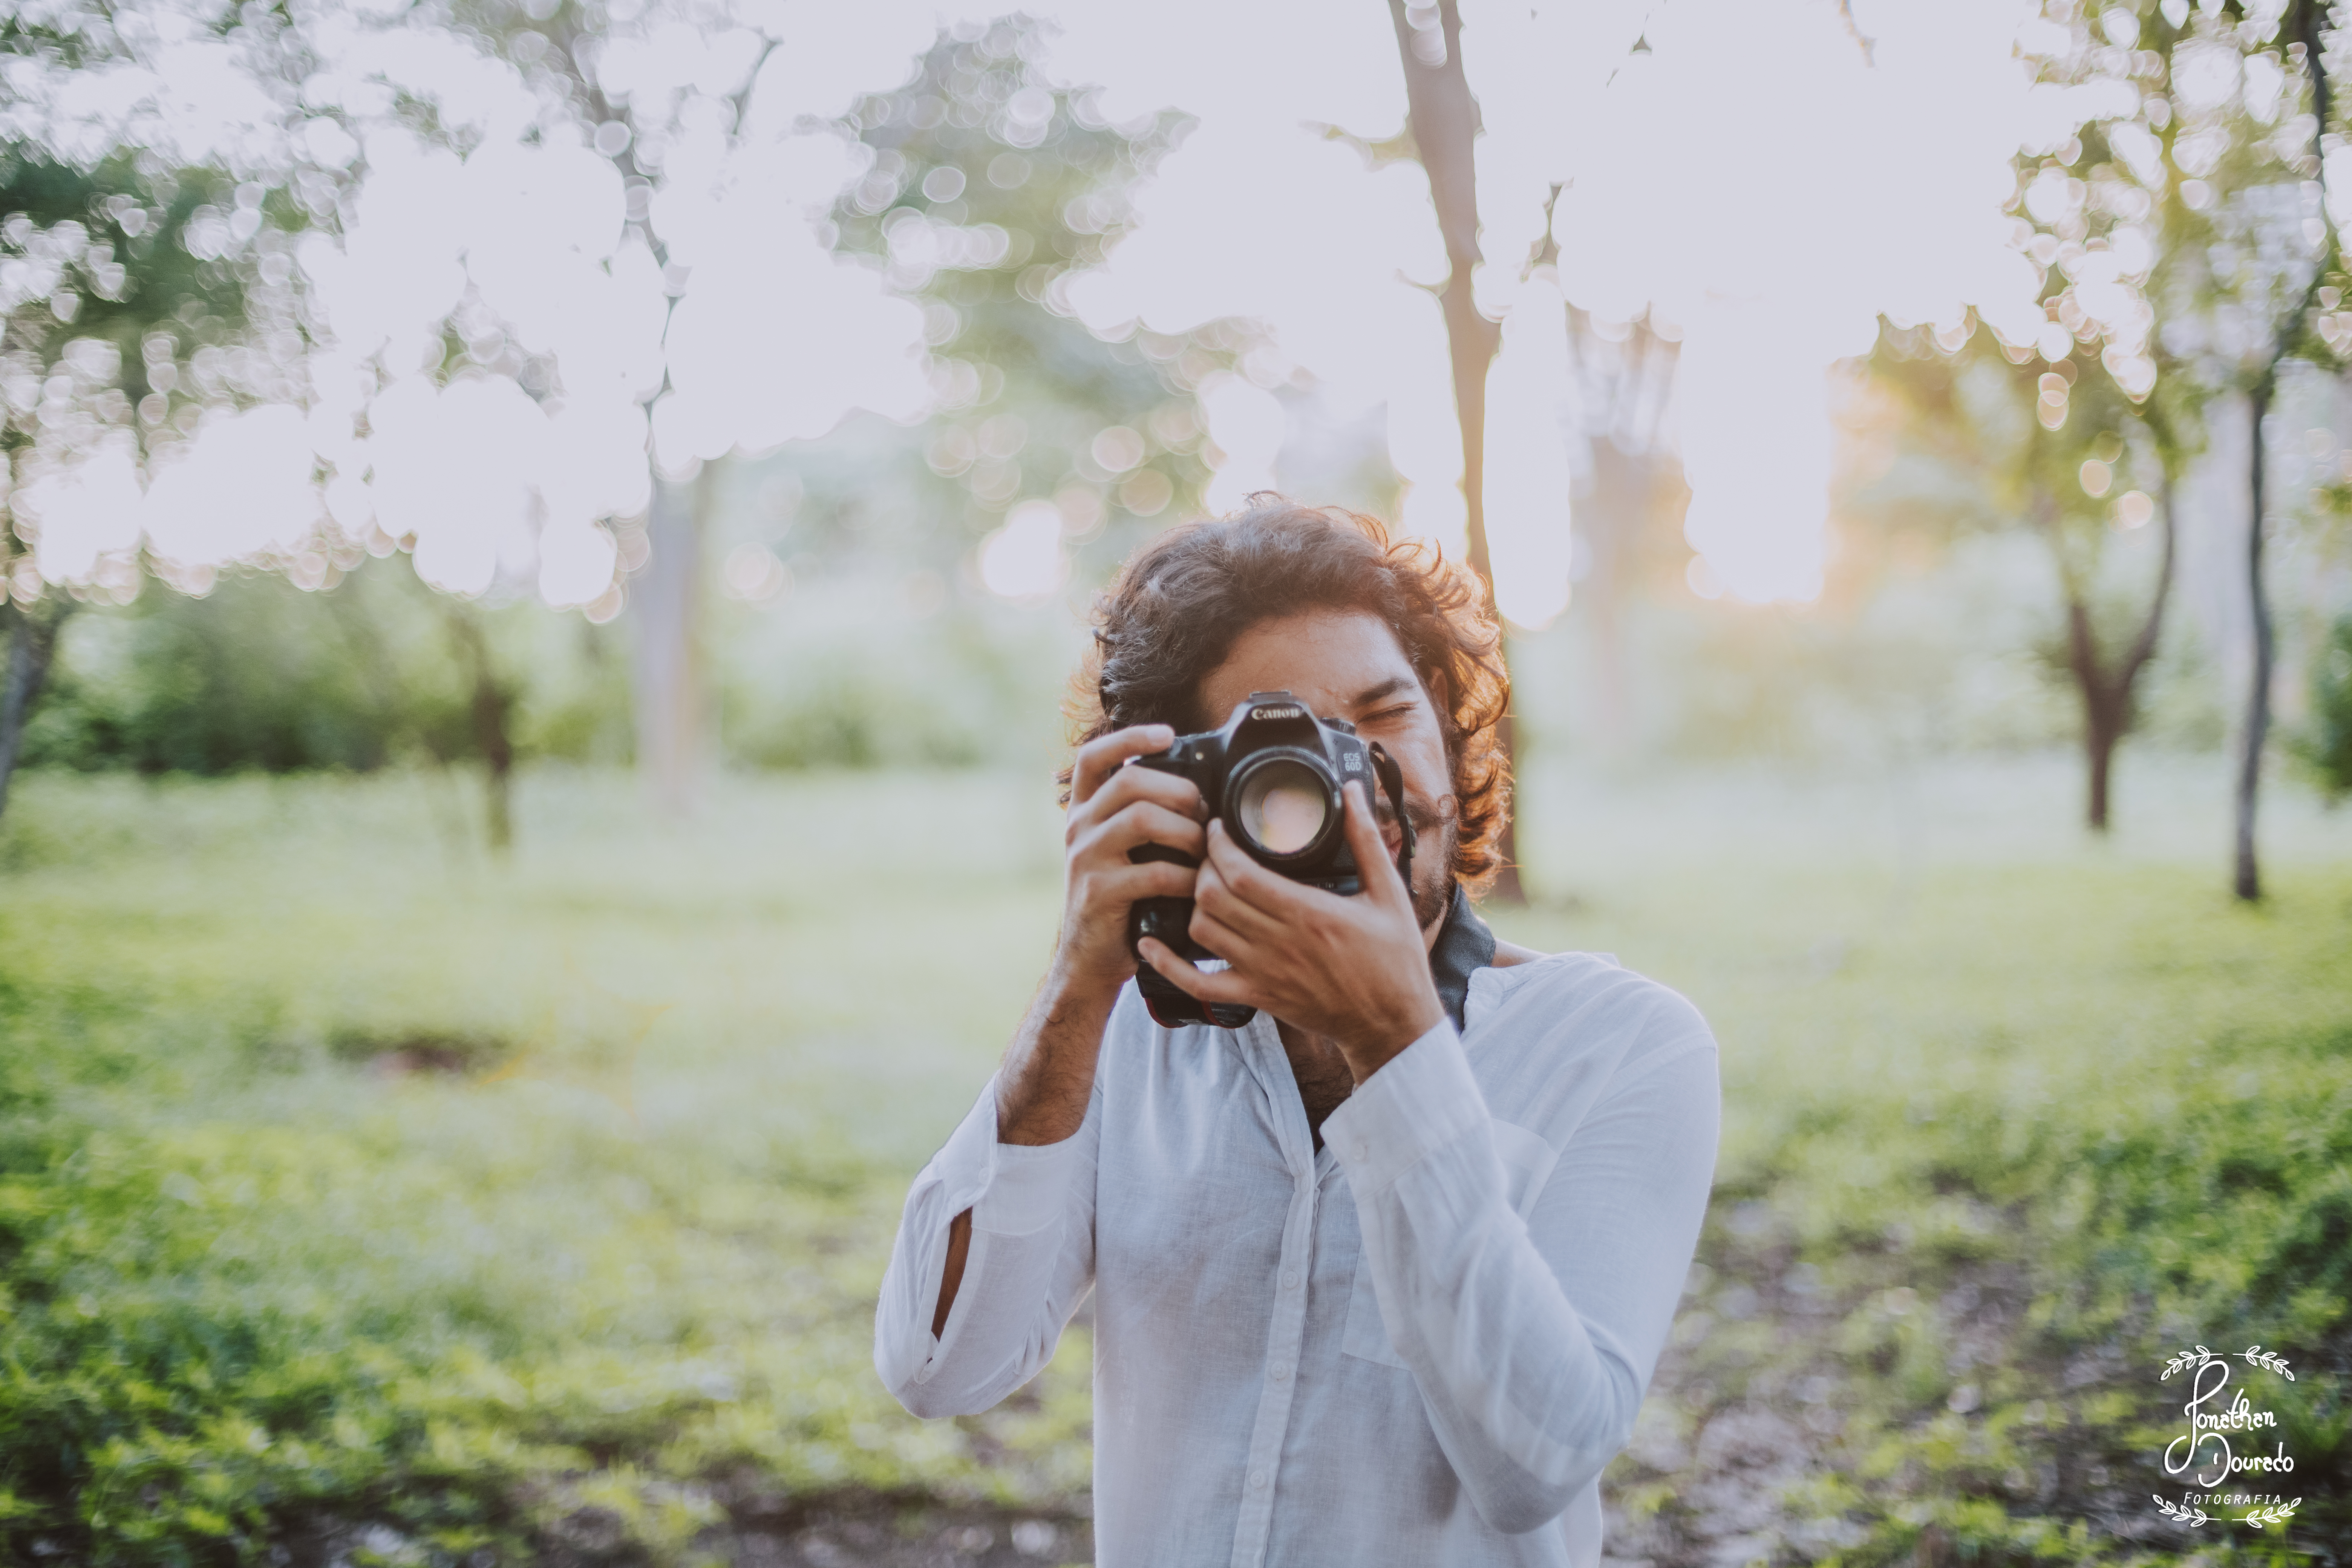 Contate Jonathan Dourado - Fotógrafo de Famílias | Teresina - Piauí | Aniversários, Casamentos, Documental, Formaturas